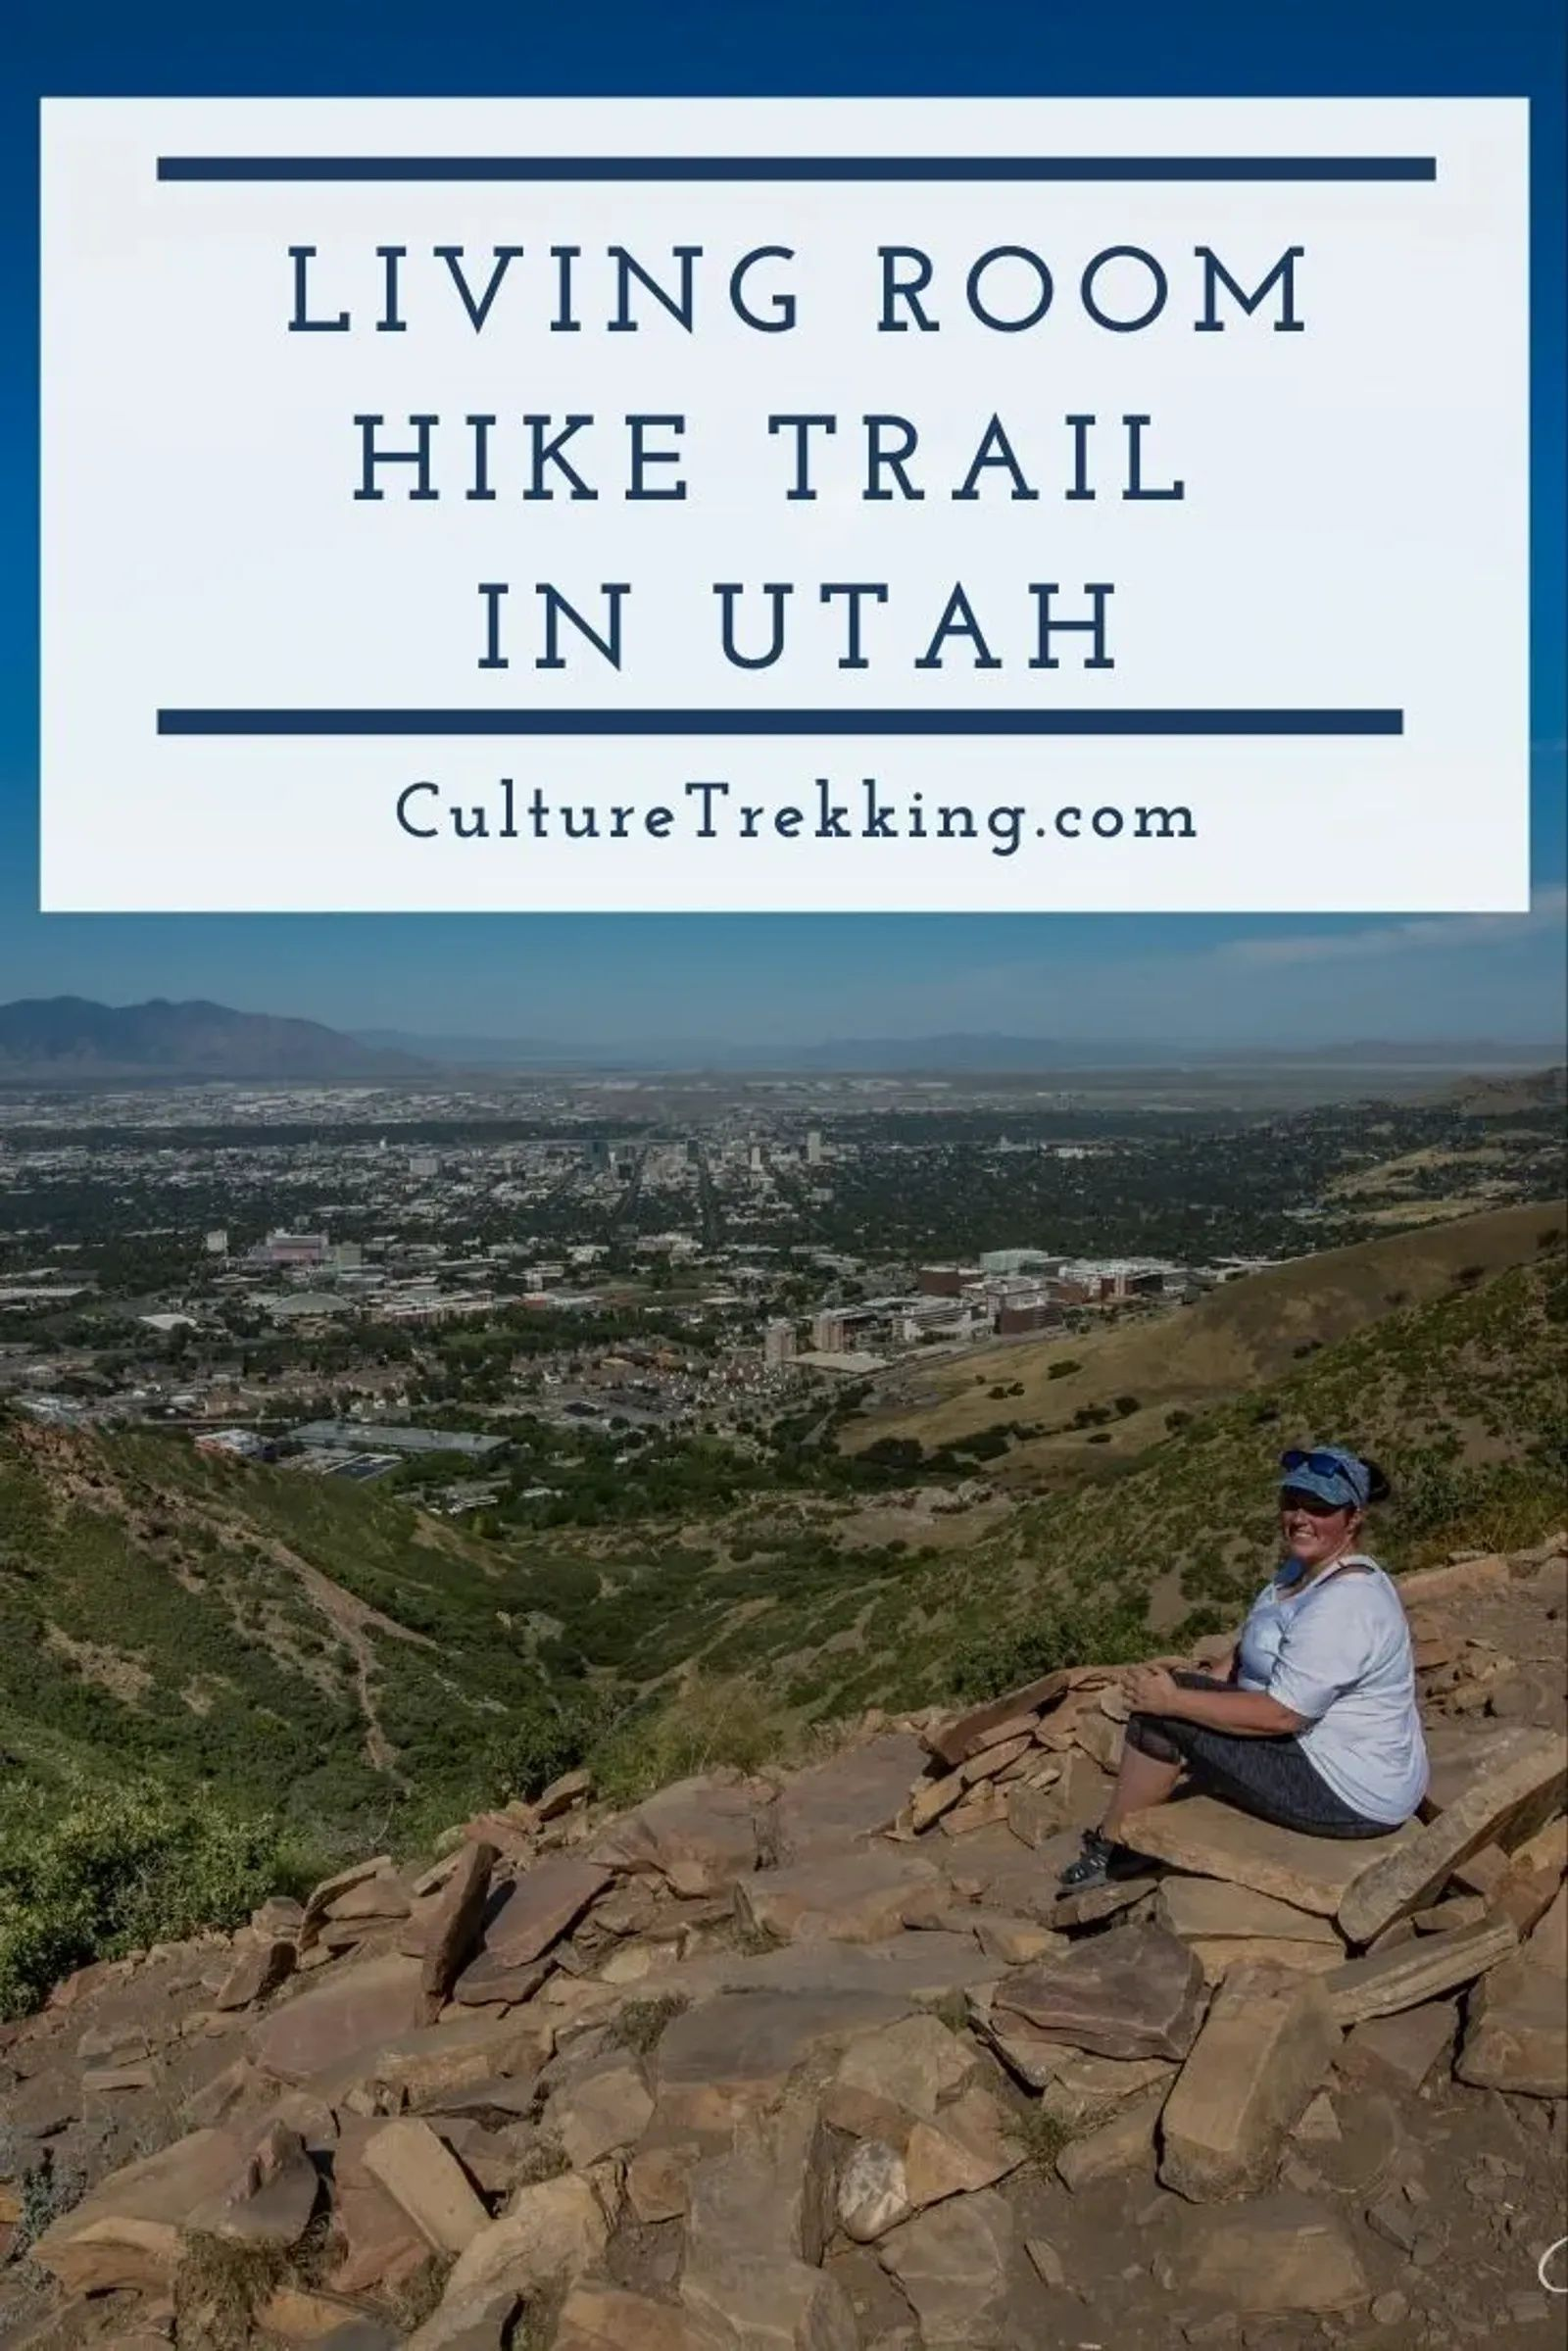 Living Room Hike In Salt Lake City How To Not Get Lost Travel Salt Lake City Salt Lake City Hikes Utah Hiking Trails